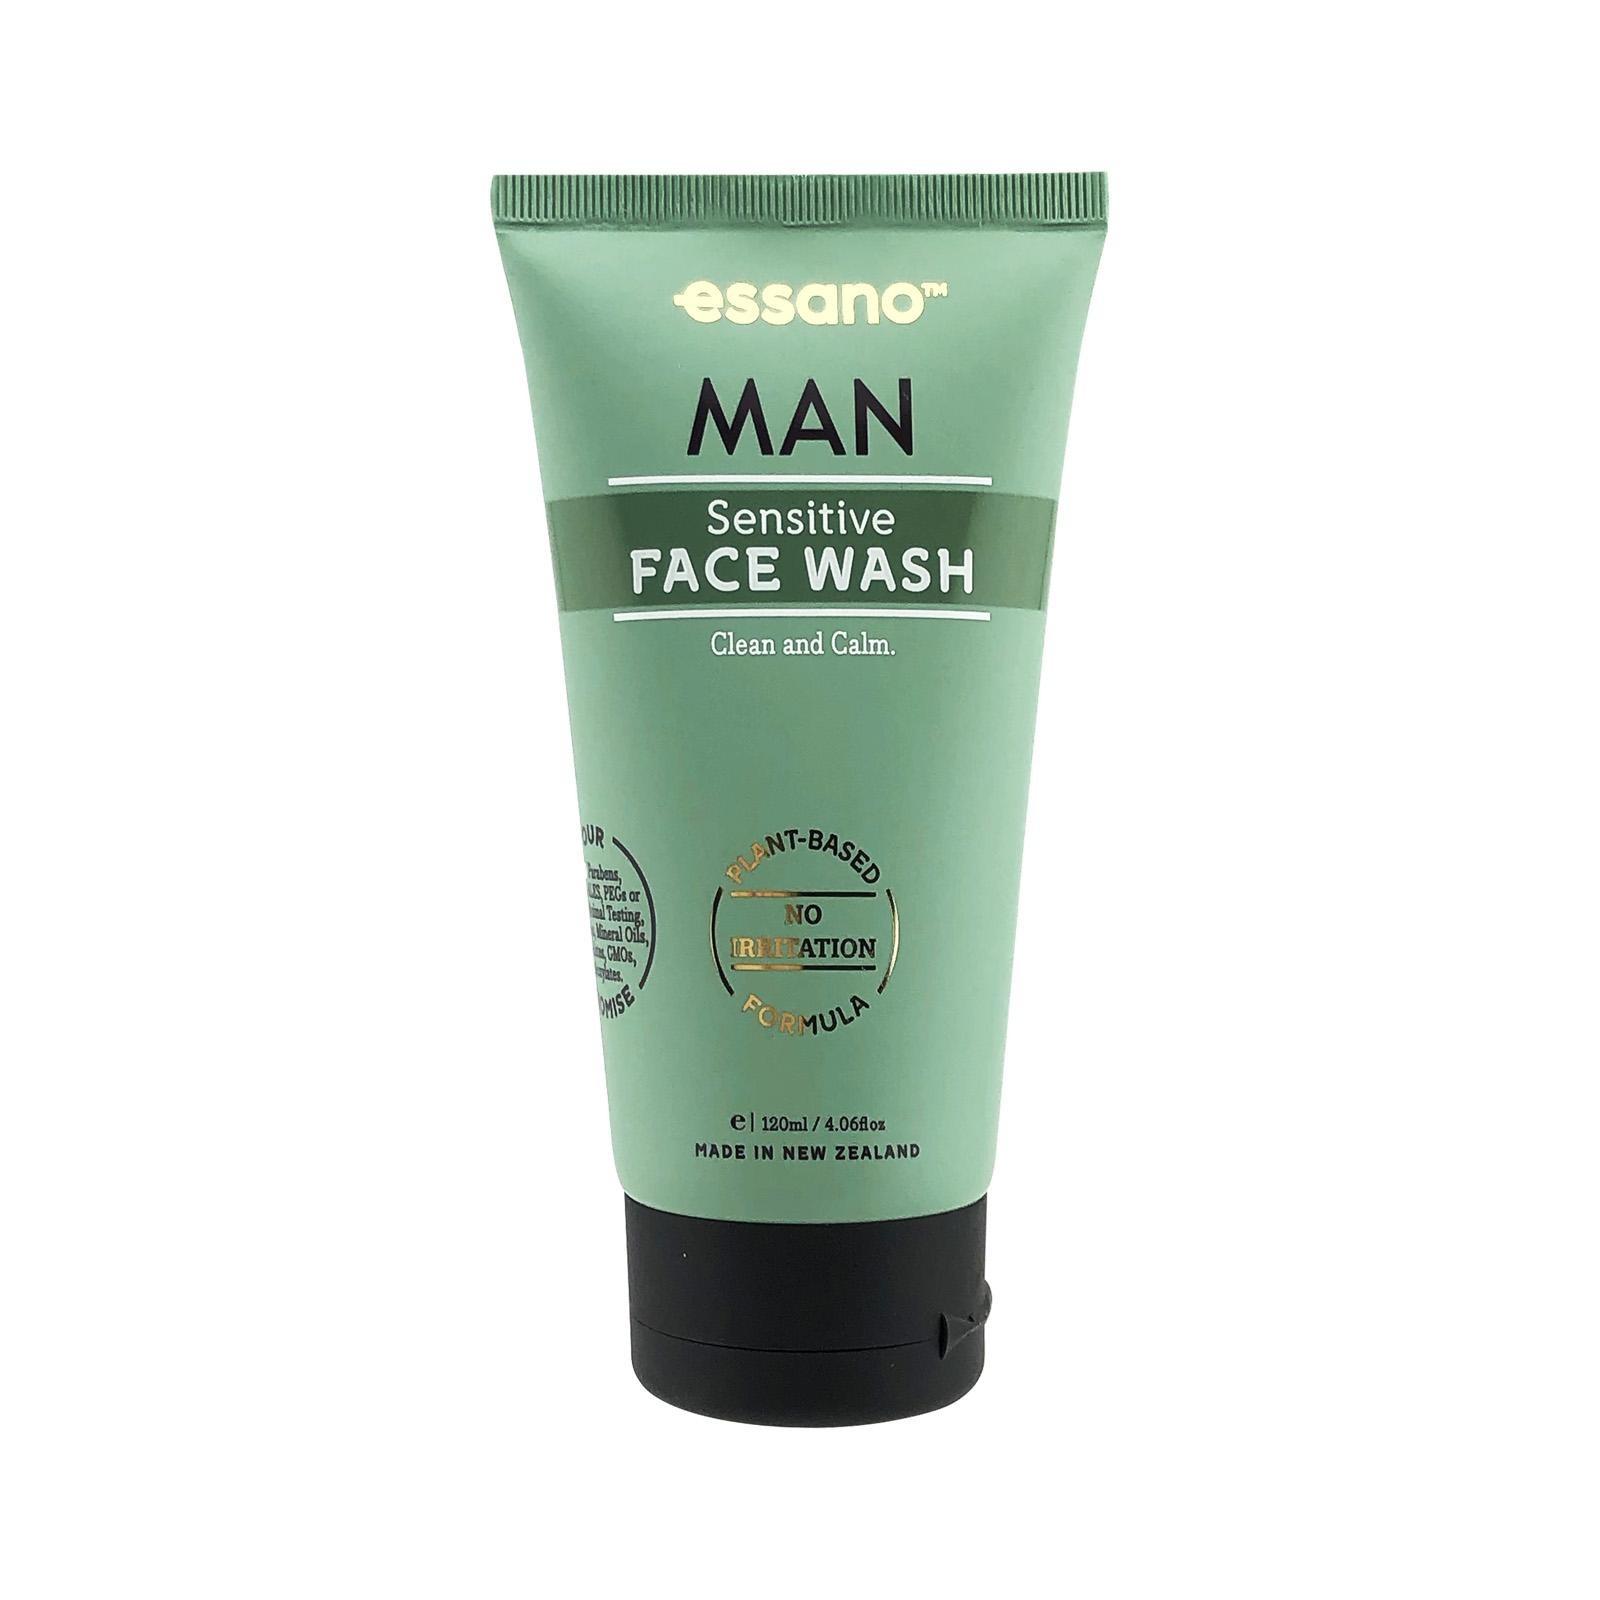 Essano Man Face Wash Sensitive